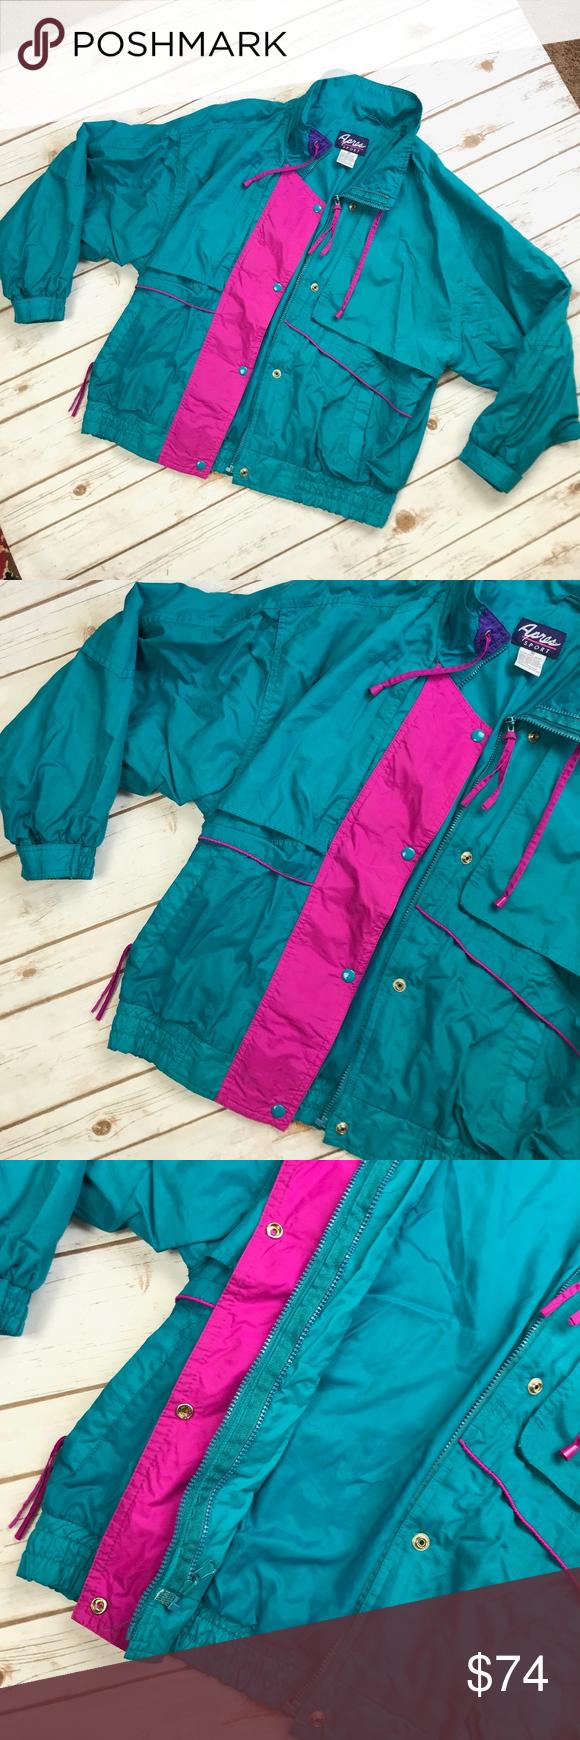 Vintage s apres sport turquoise ski jacket m my posh picks